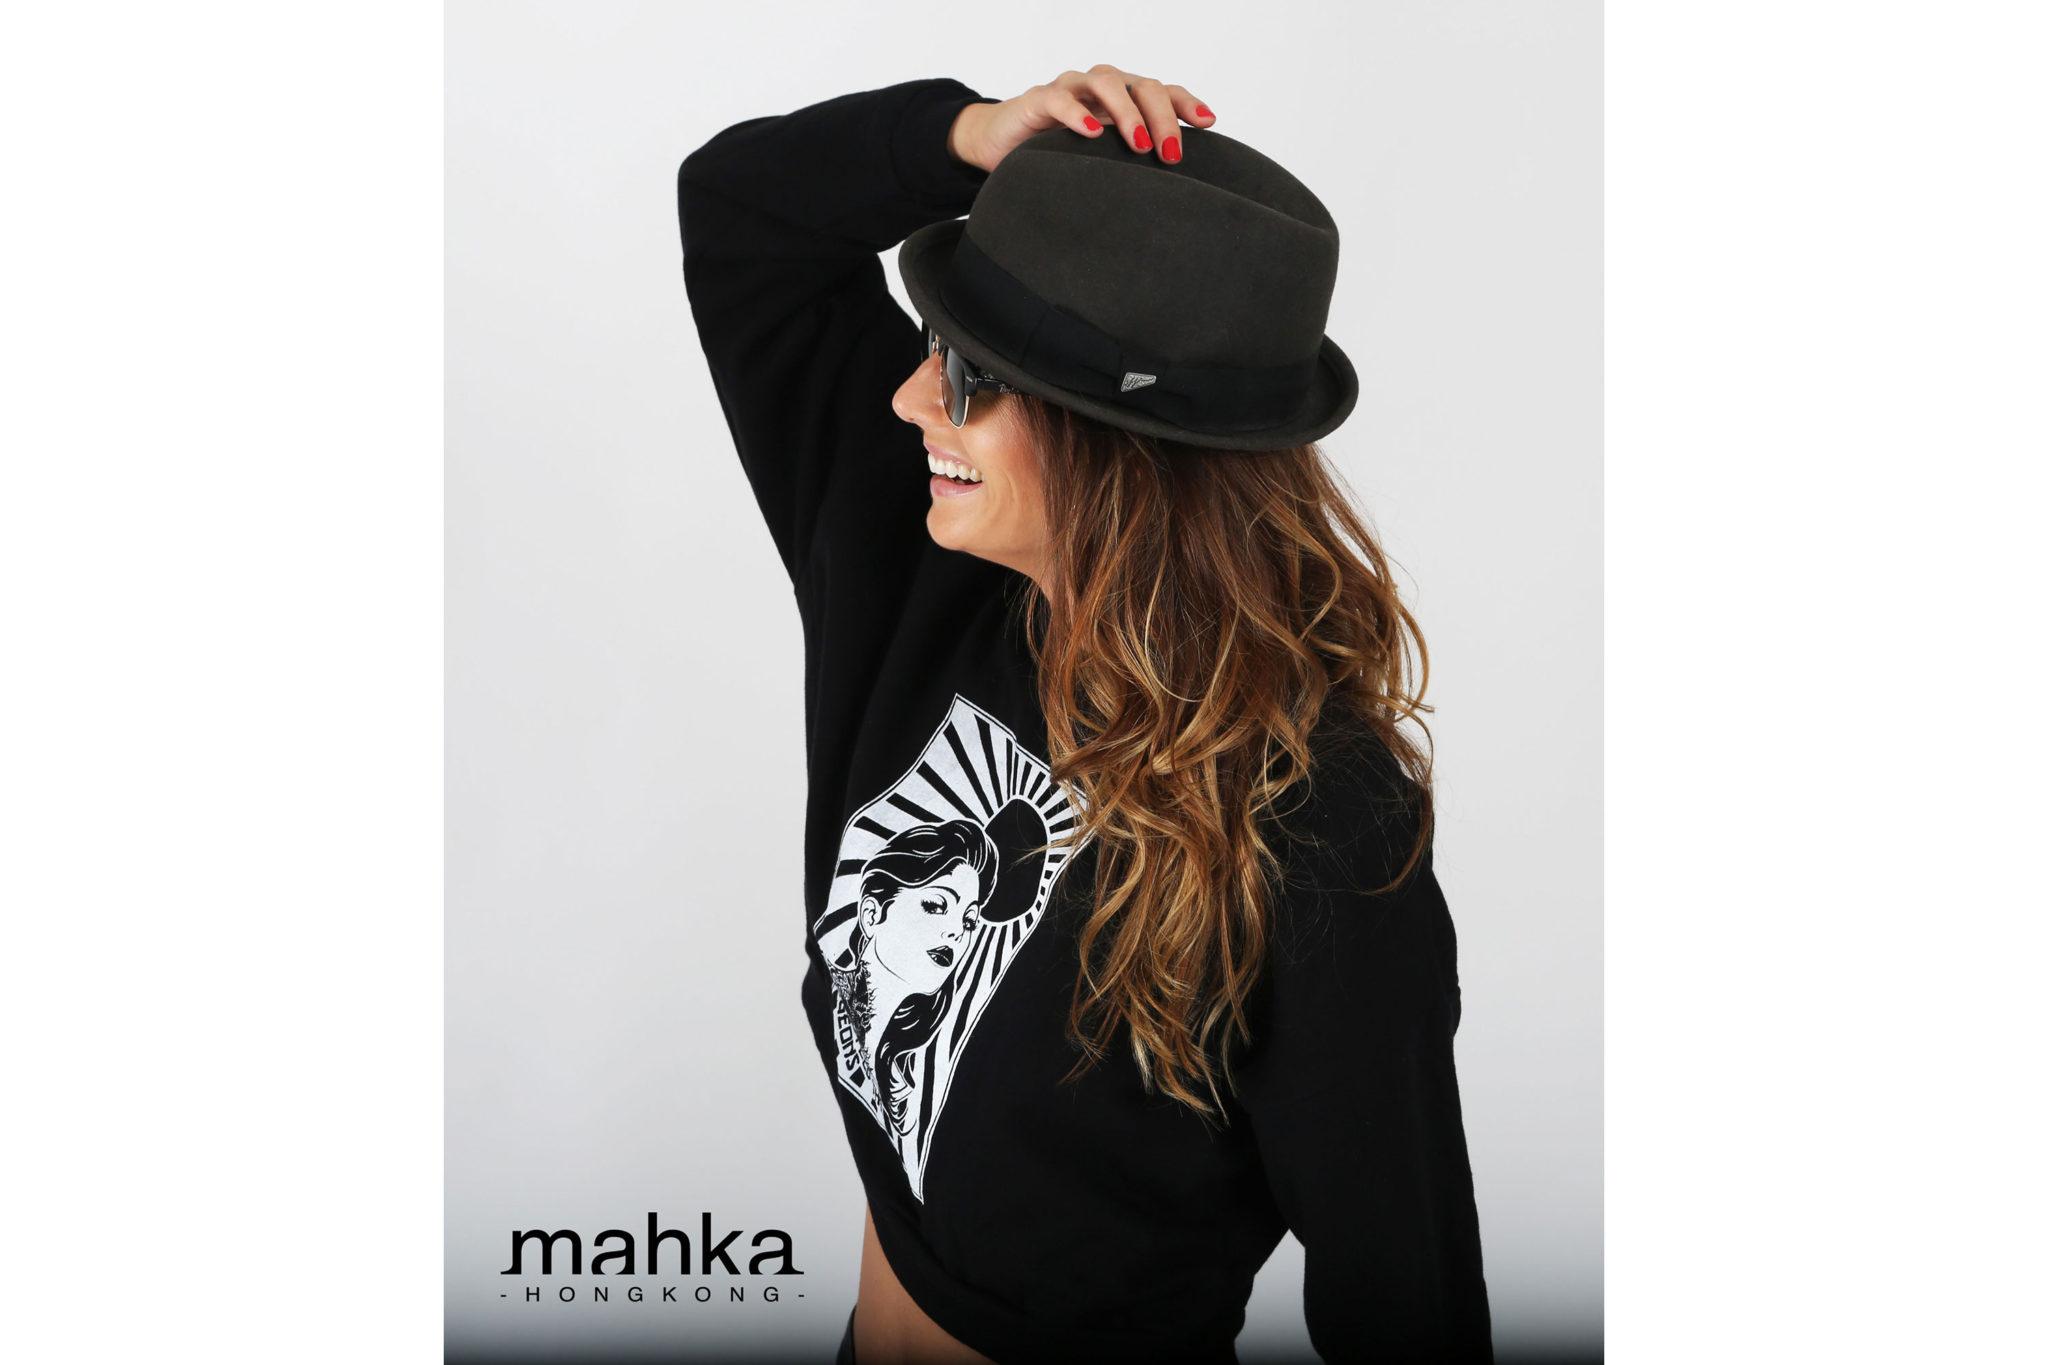 mahka-hong-kong-WDFTP-3